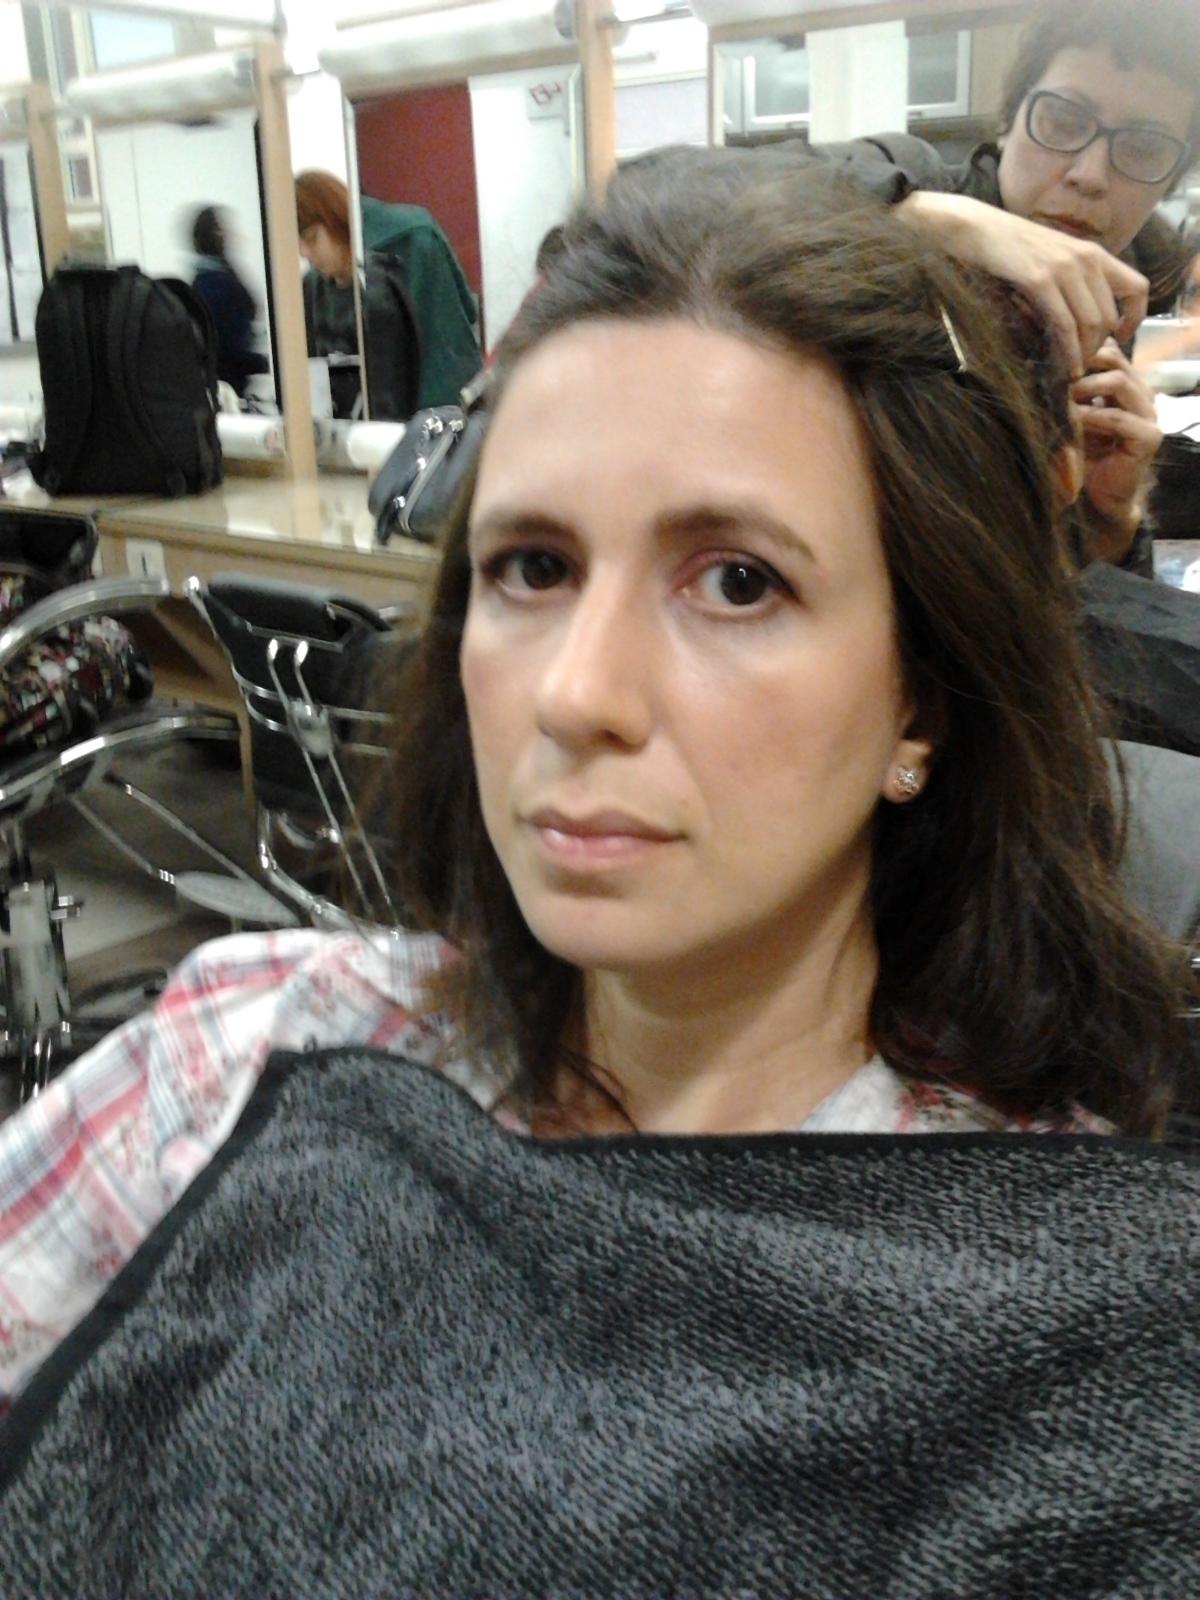 Maquiagem05 maquiador(a) consultor(a) de estetica